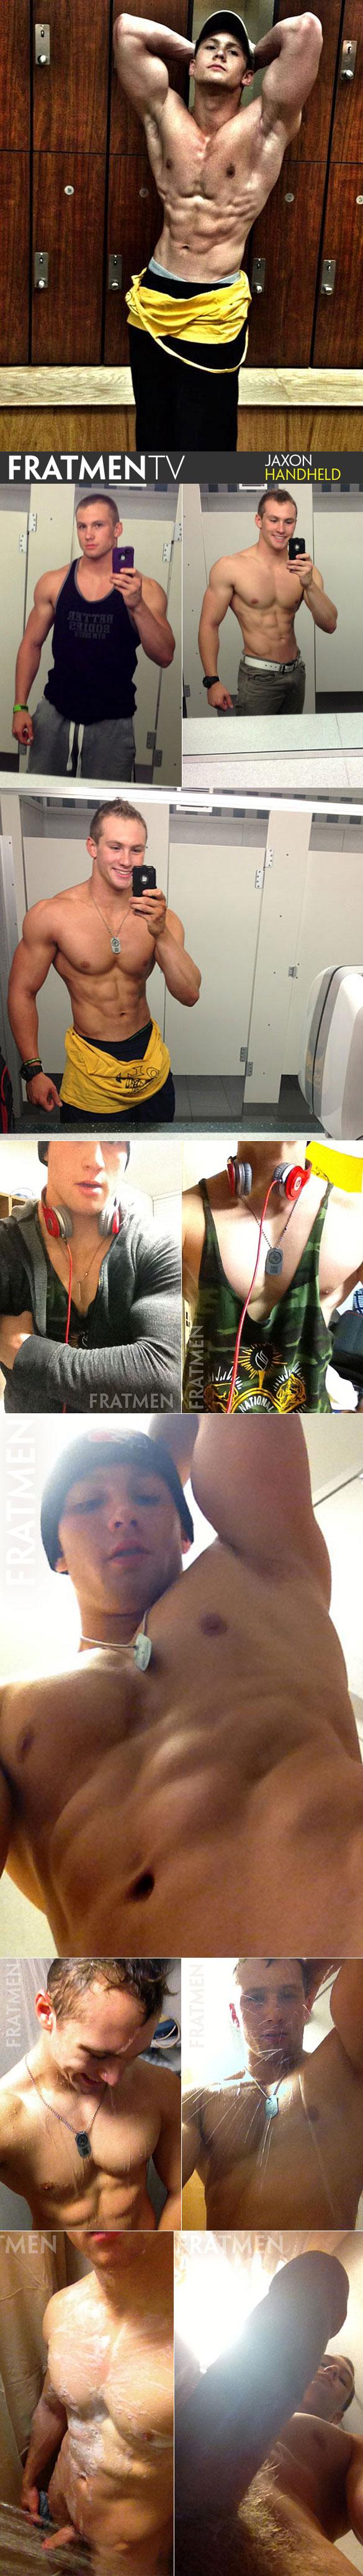 "Fratmen.tv: ""Jaxon Handheld"""